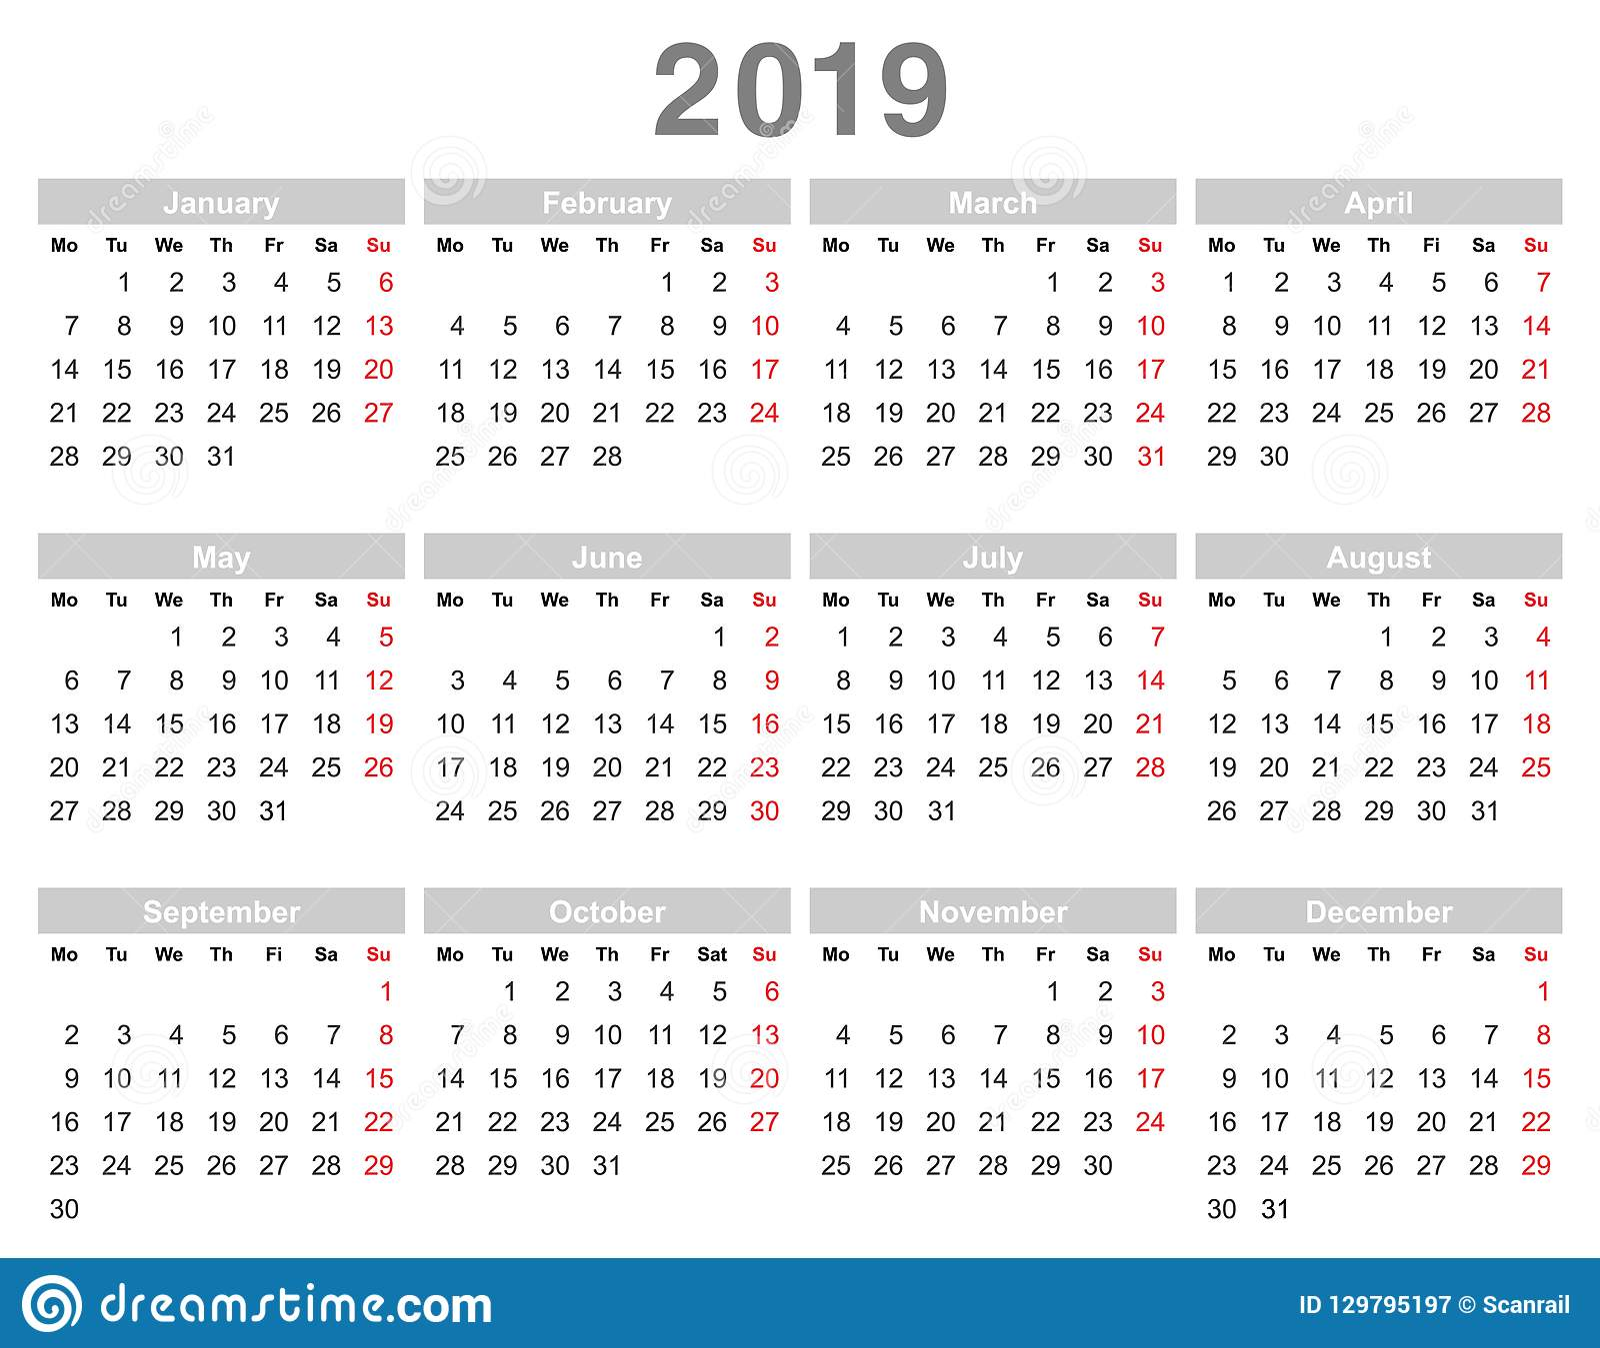 Annual Calendar 2019 2019 Year Annual Calendar Monday First, English Stock Vector